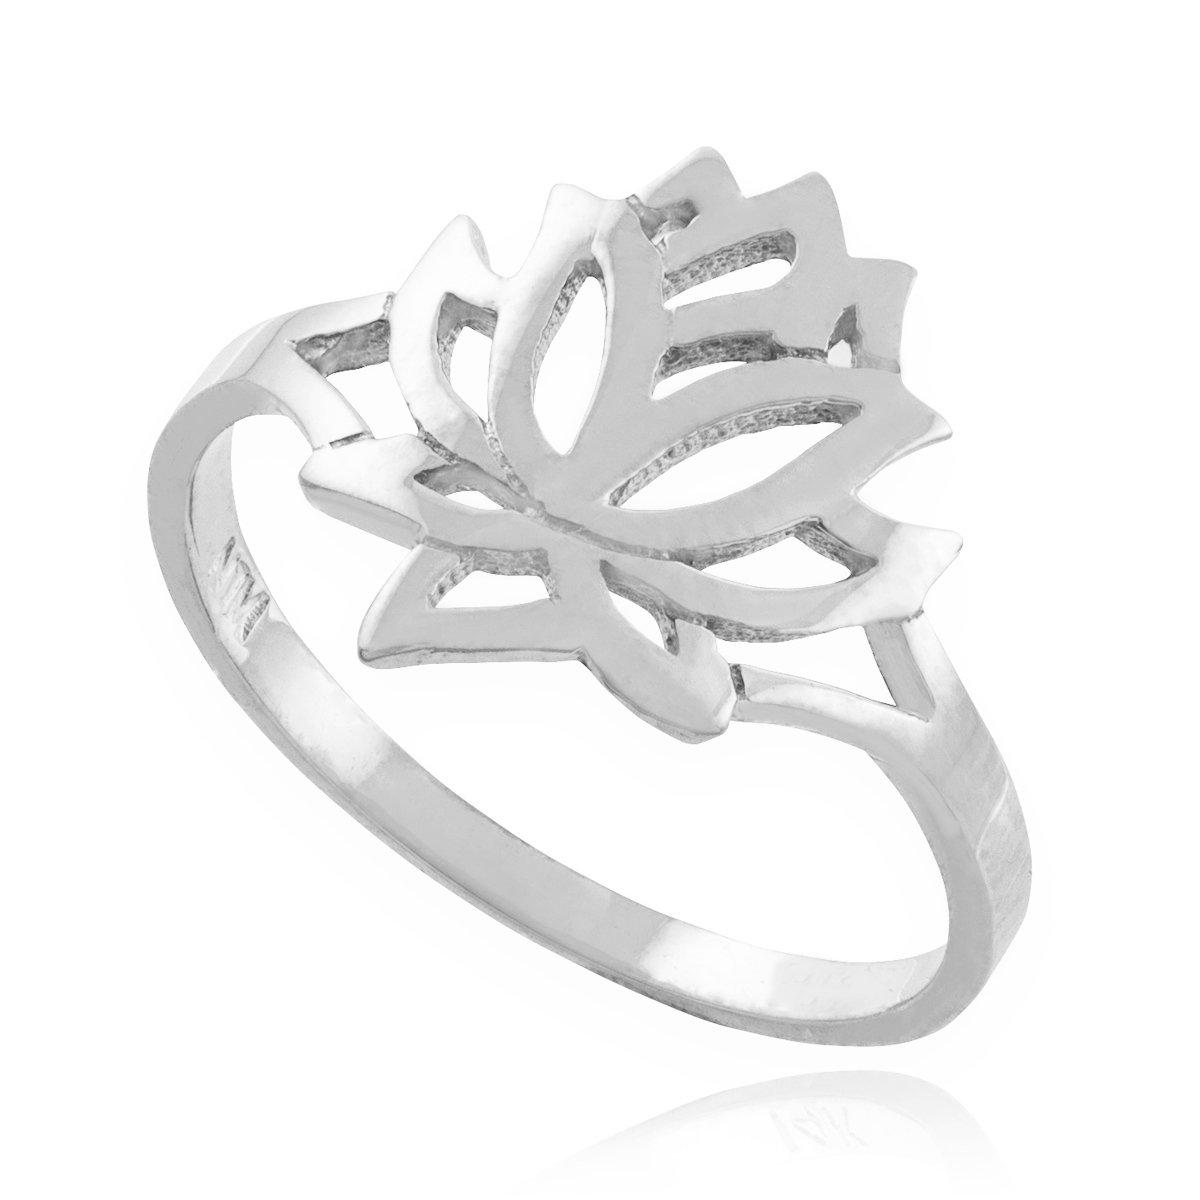 Fine 14k White Gold High Polish Open Lotus Flower Ring (Size 9)